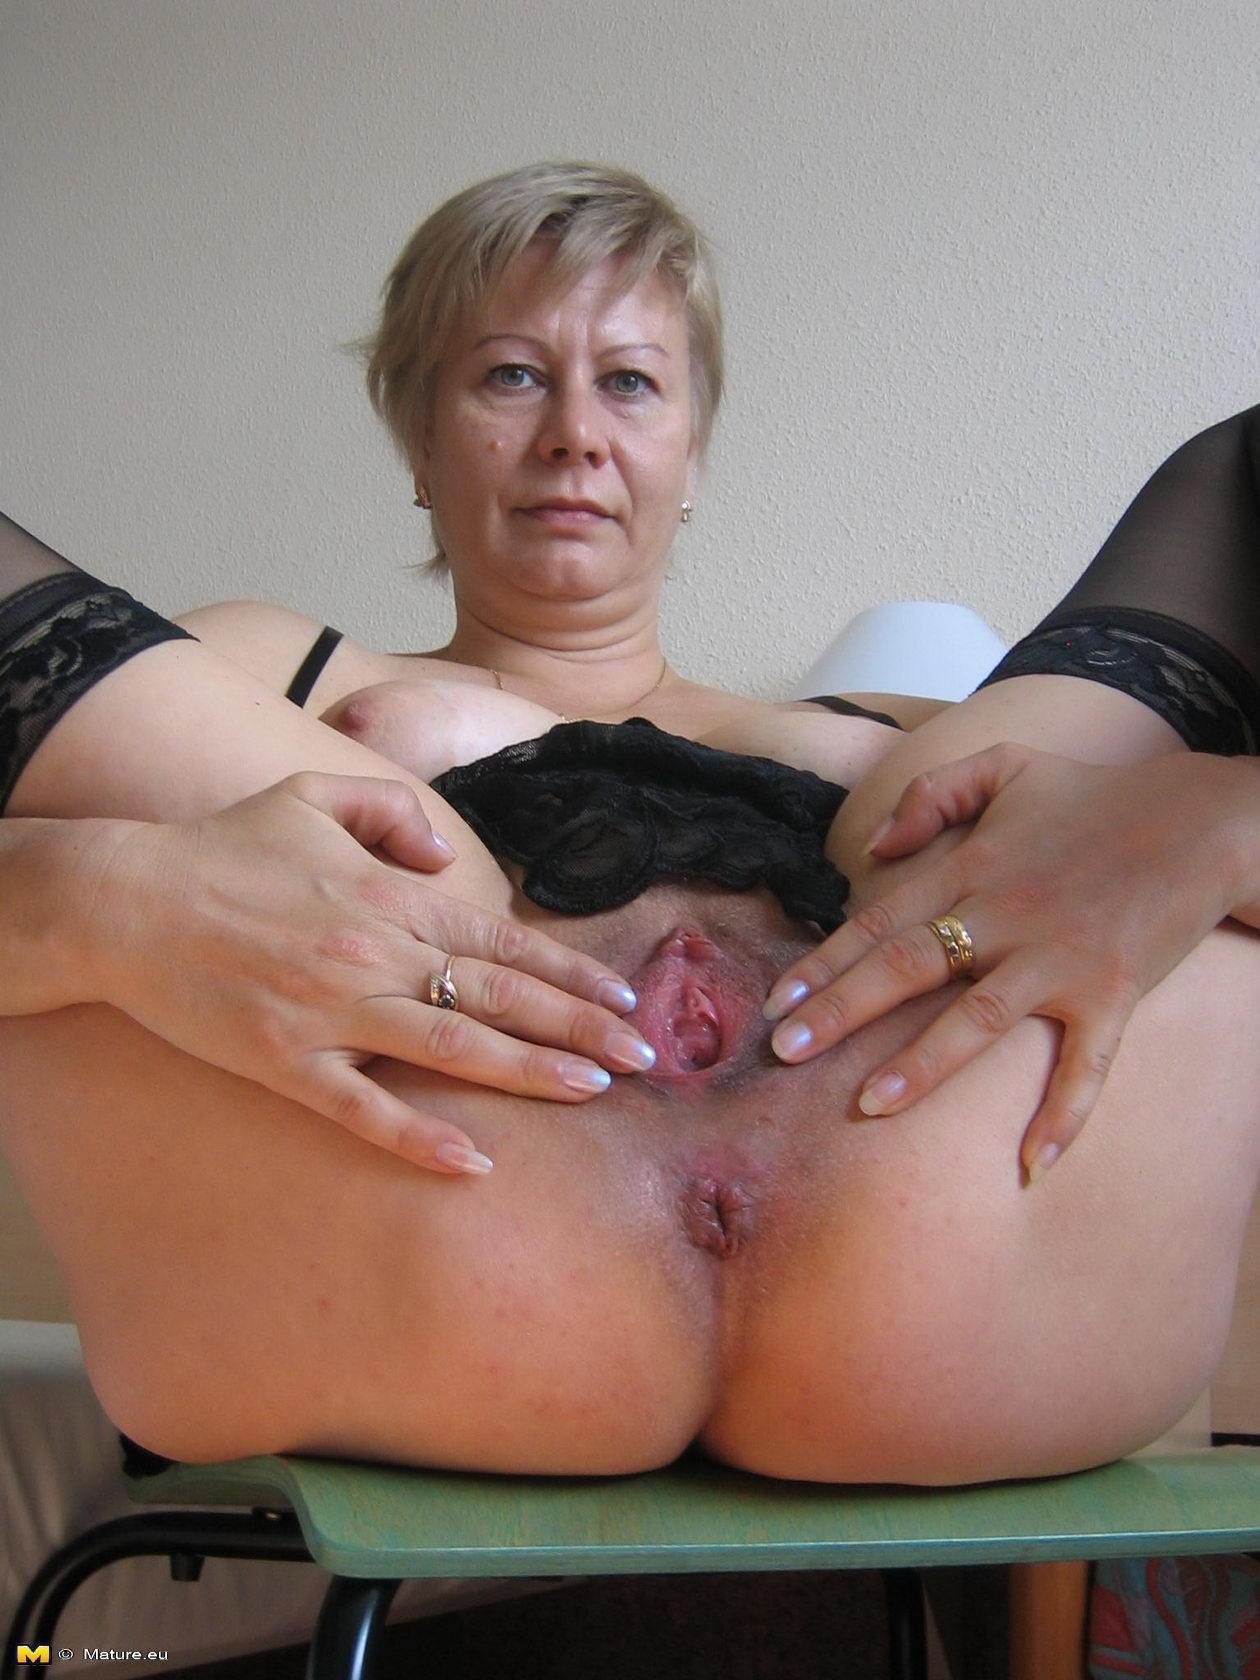 Целку доводят до оргазма онлайн 24 фотография